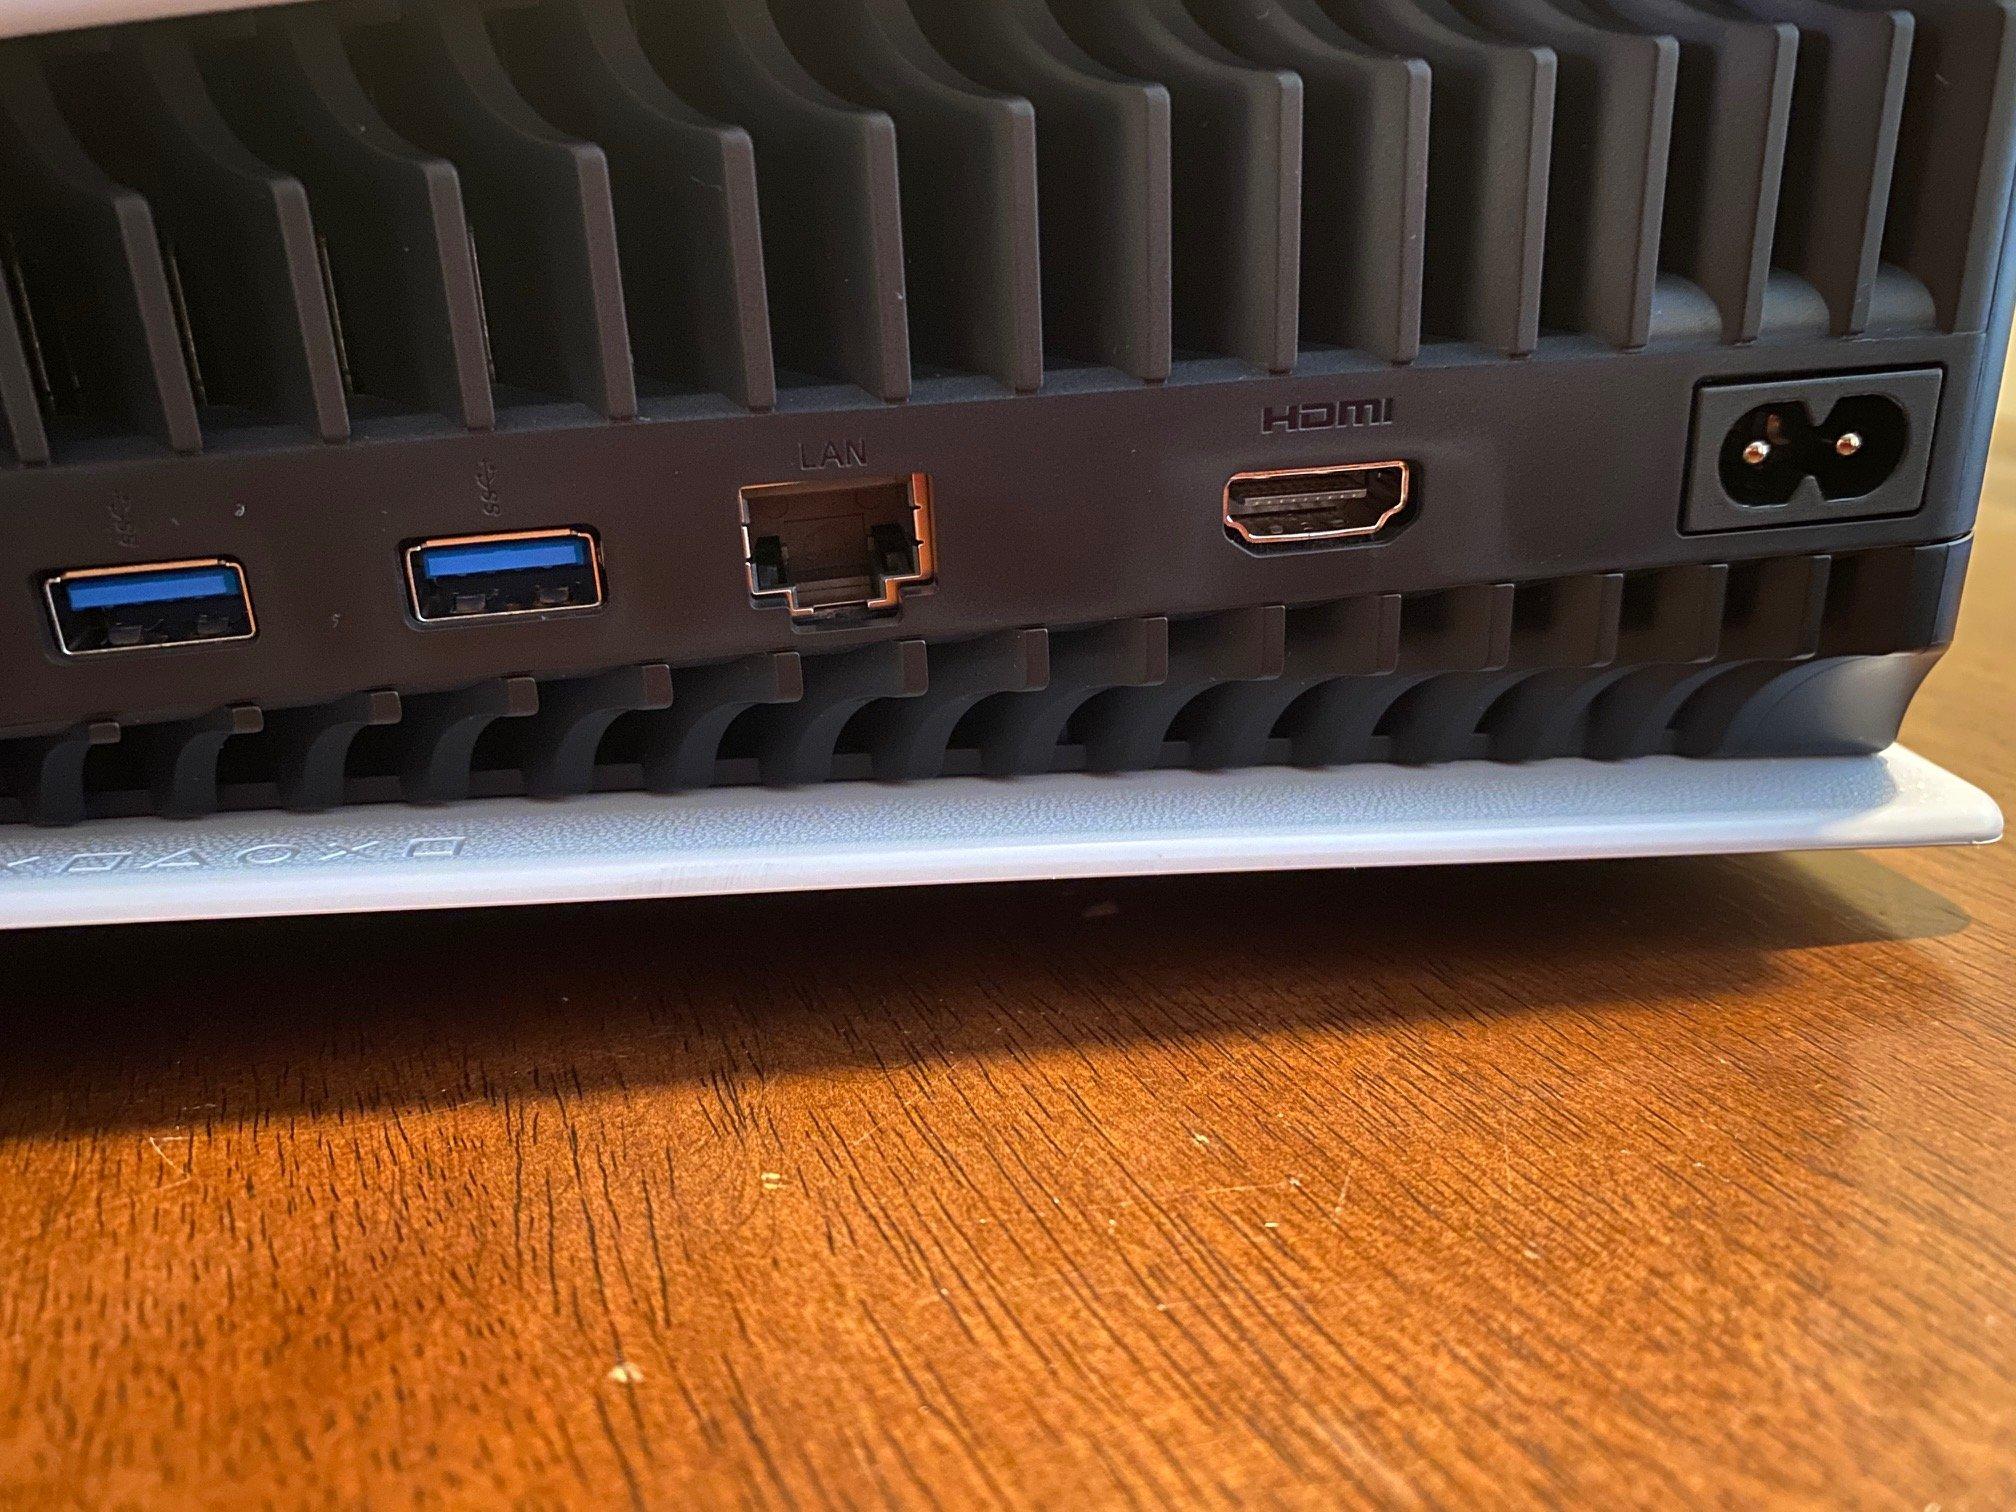 PS5 ports